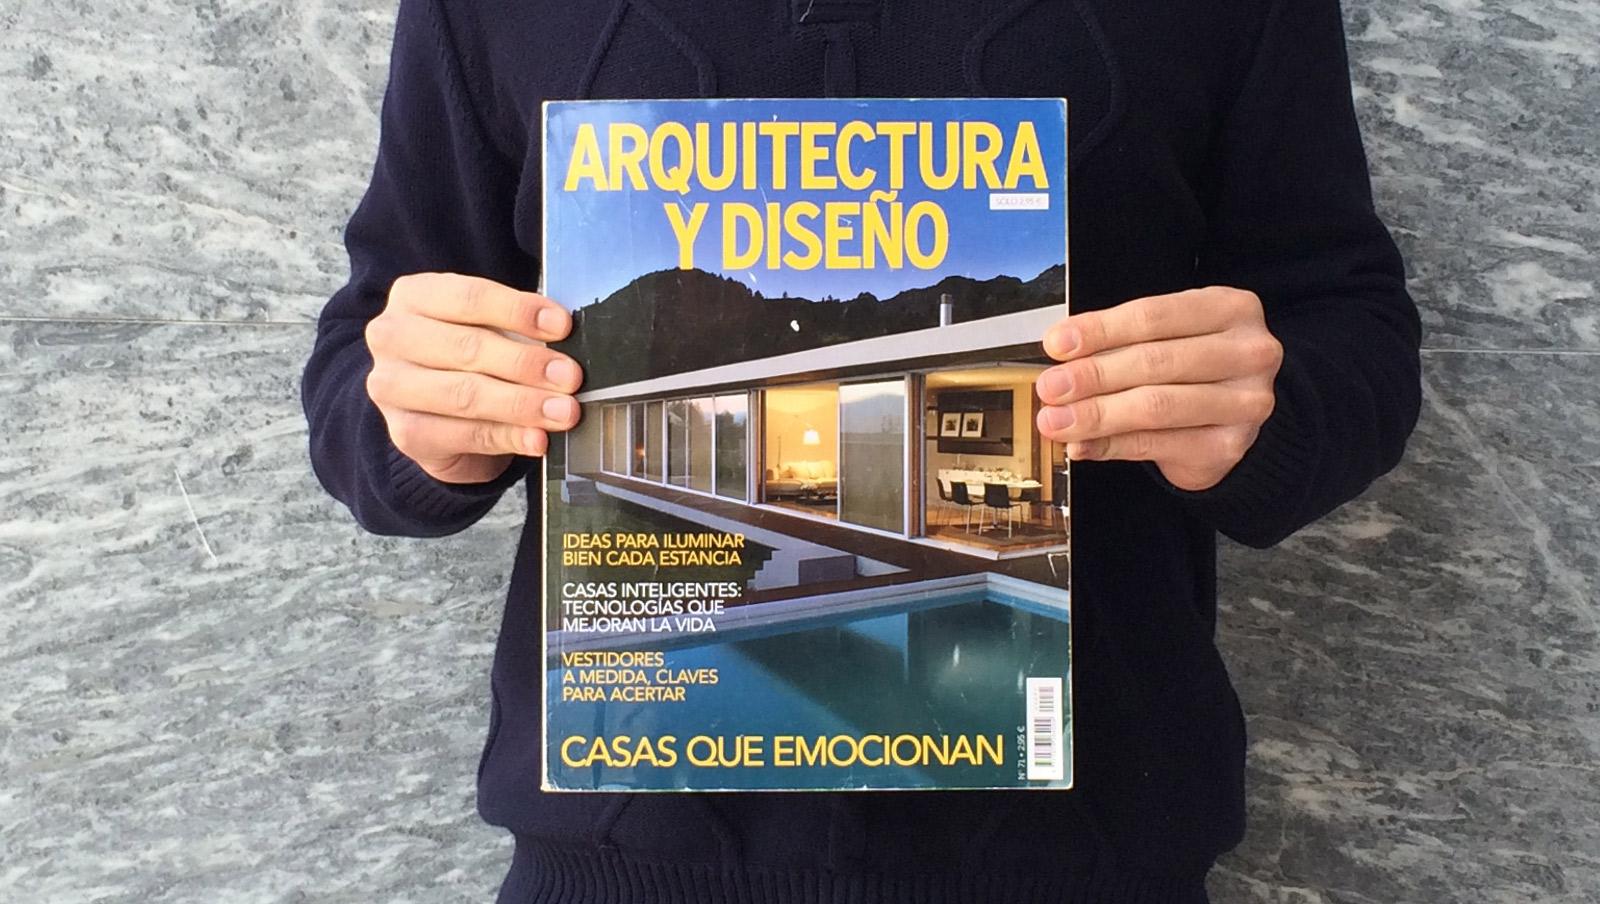 Casa mr em destaque na revista arquitectura y dise o for Revista arquitectura y diseno